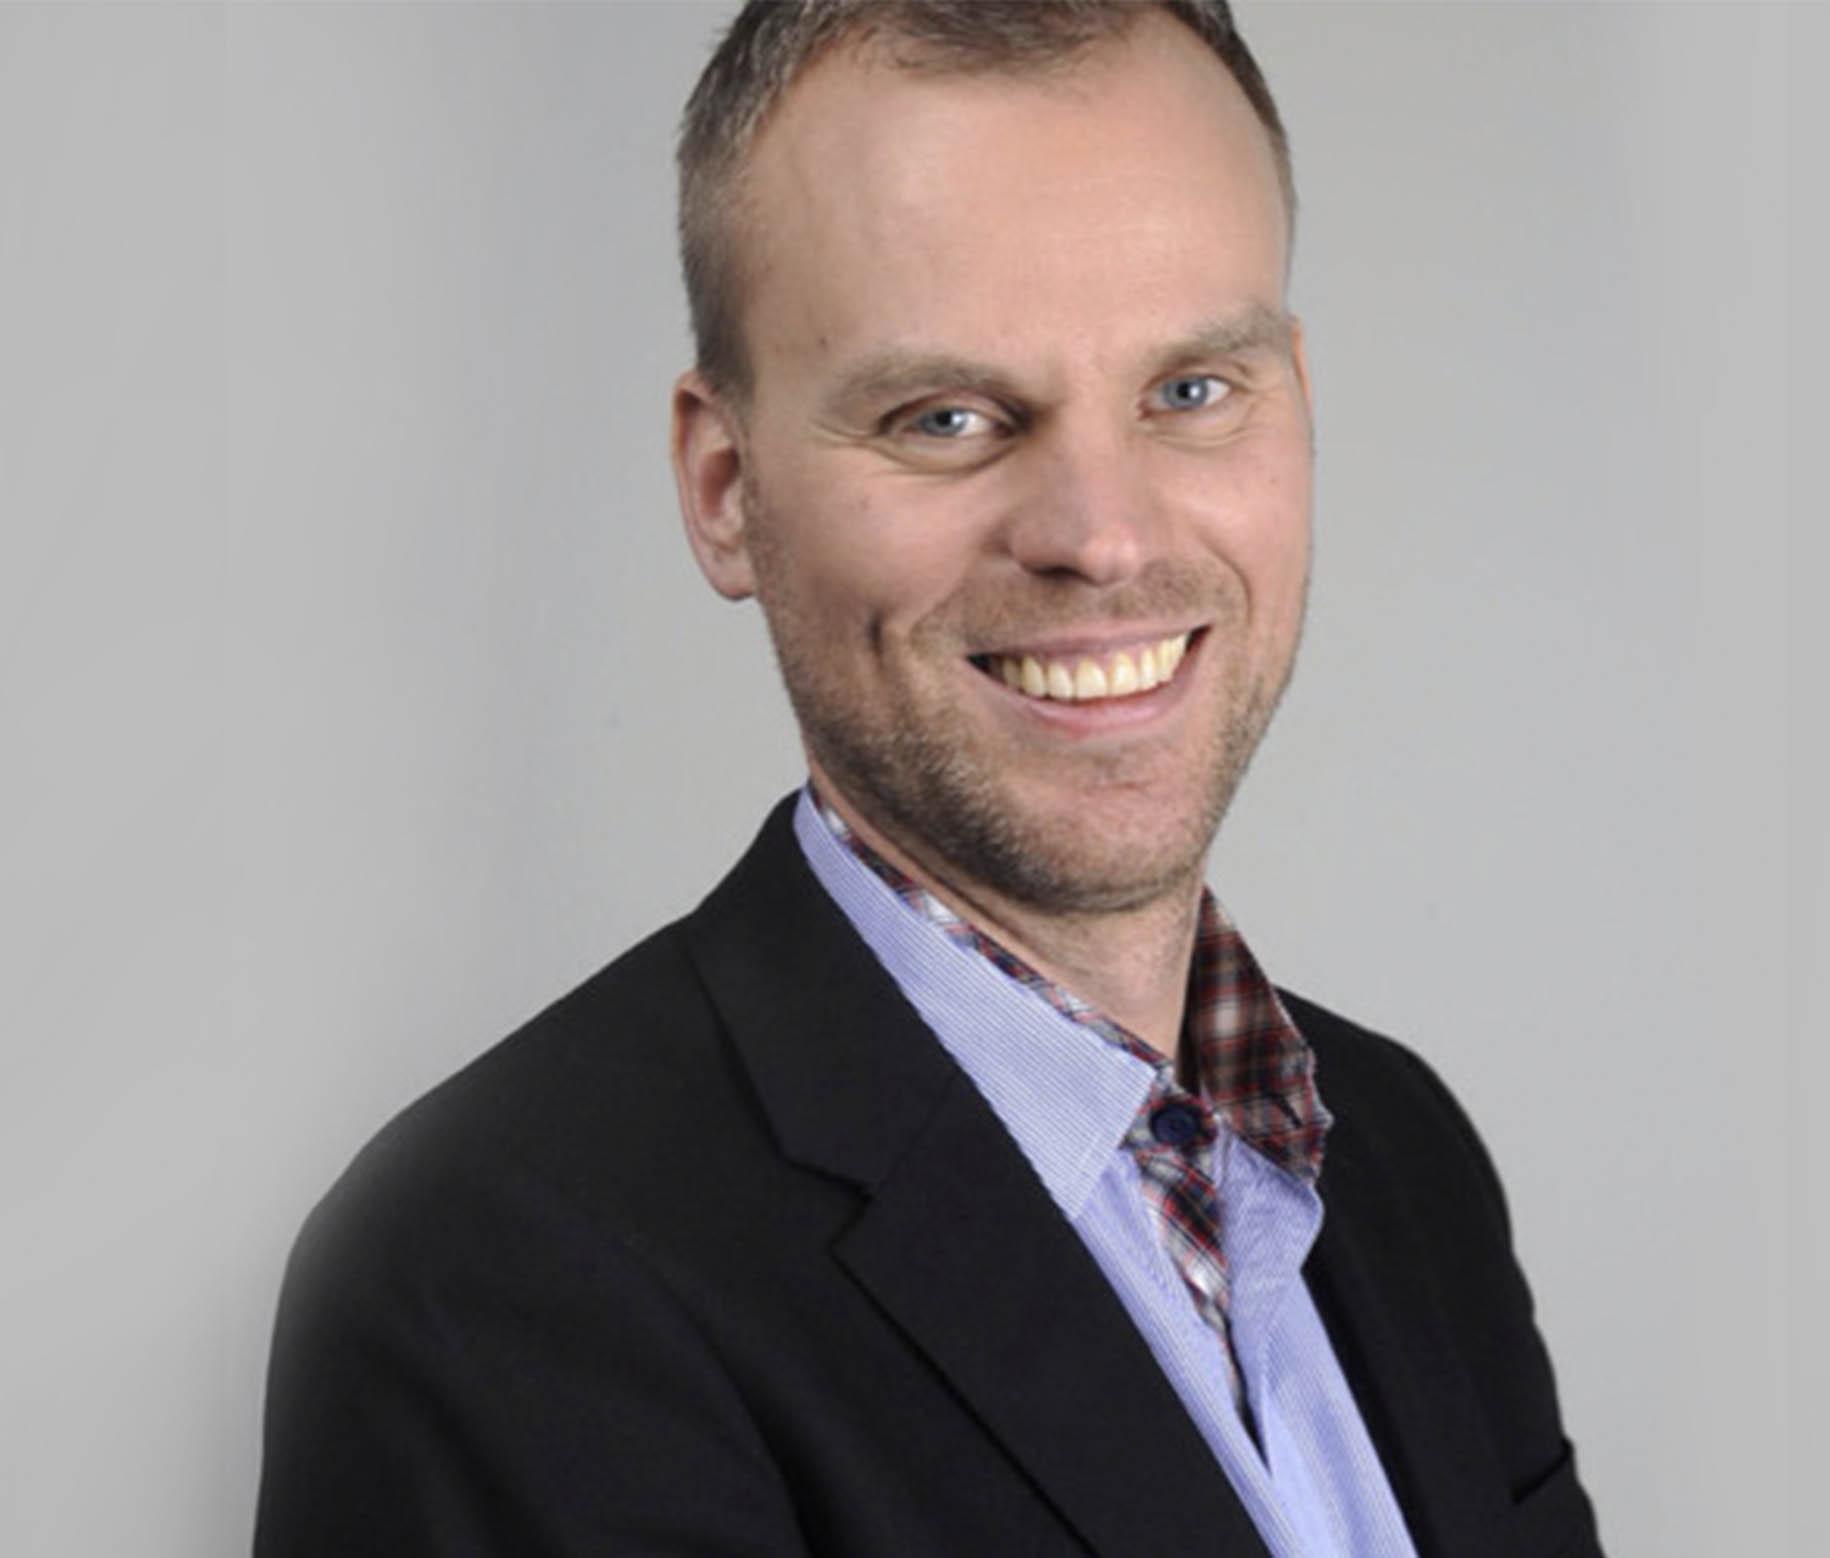 Fredrik Österström